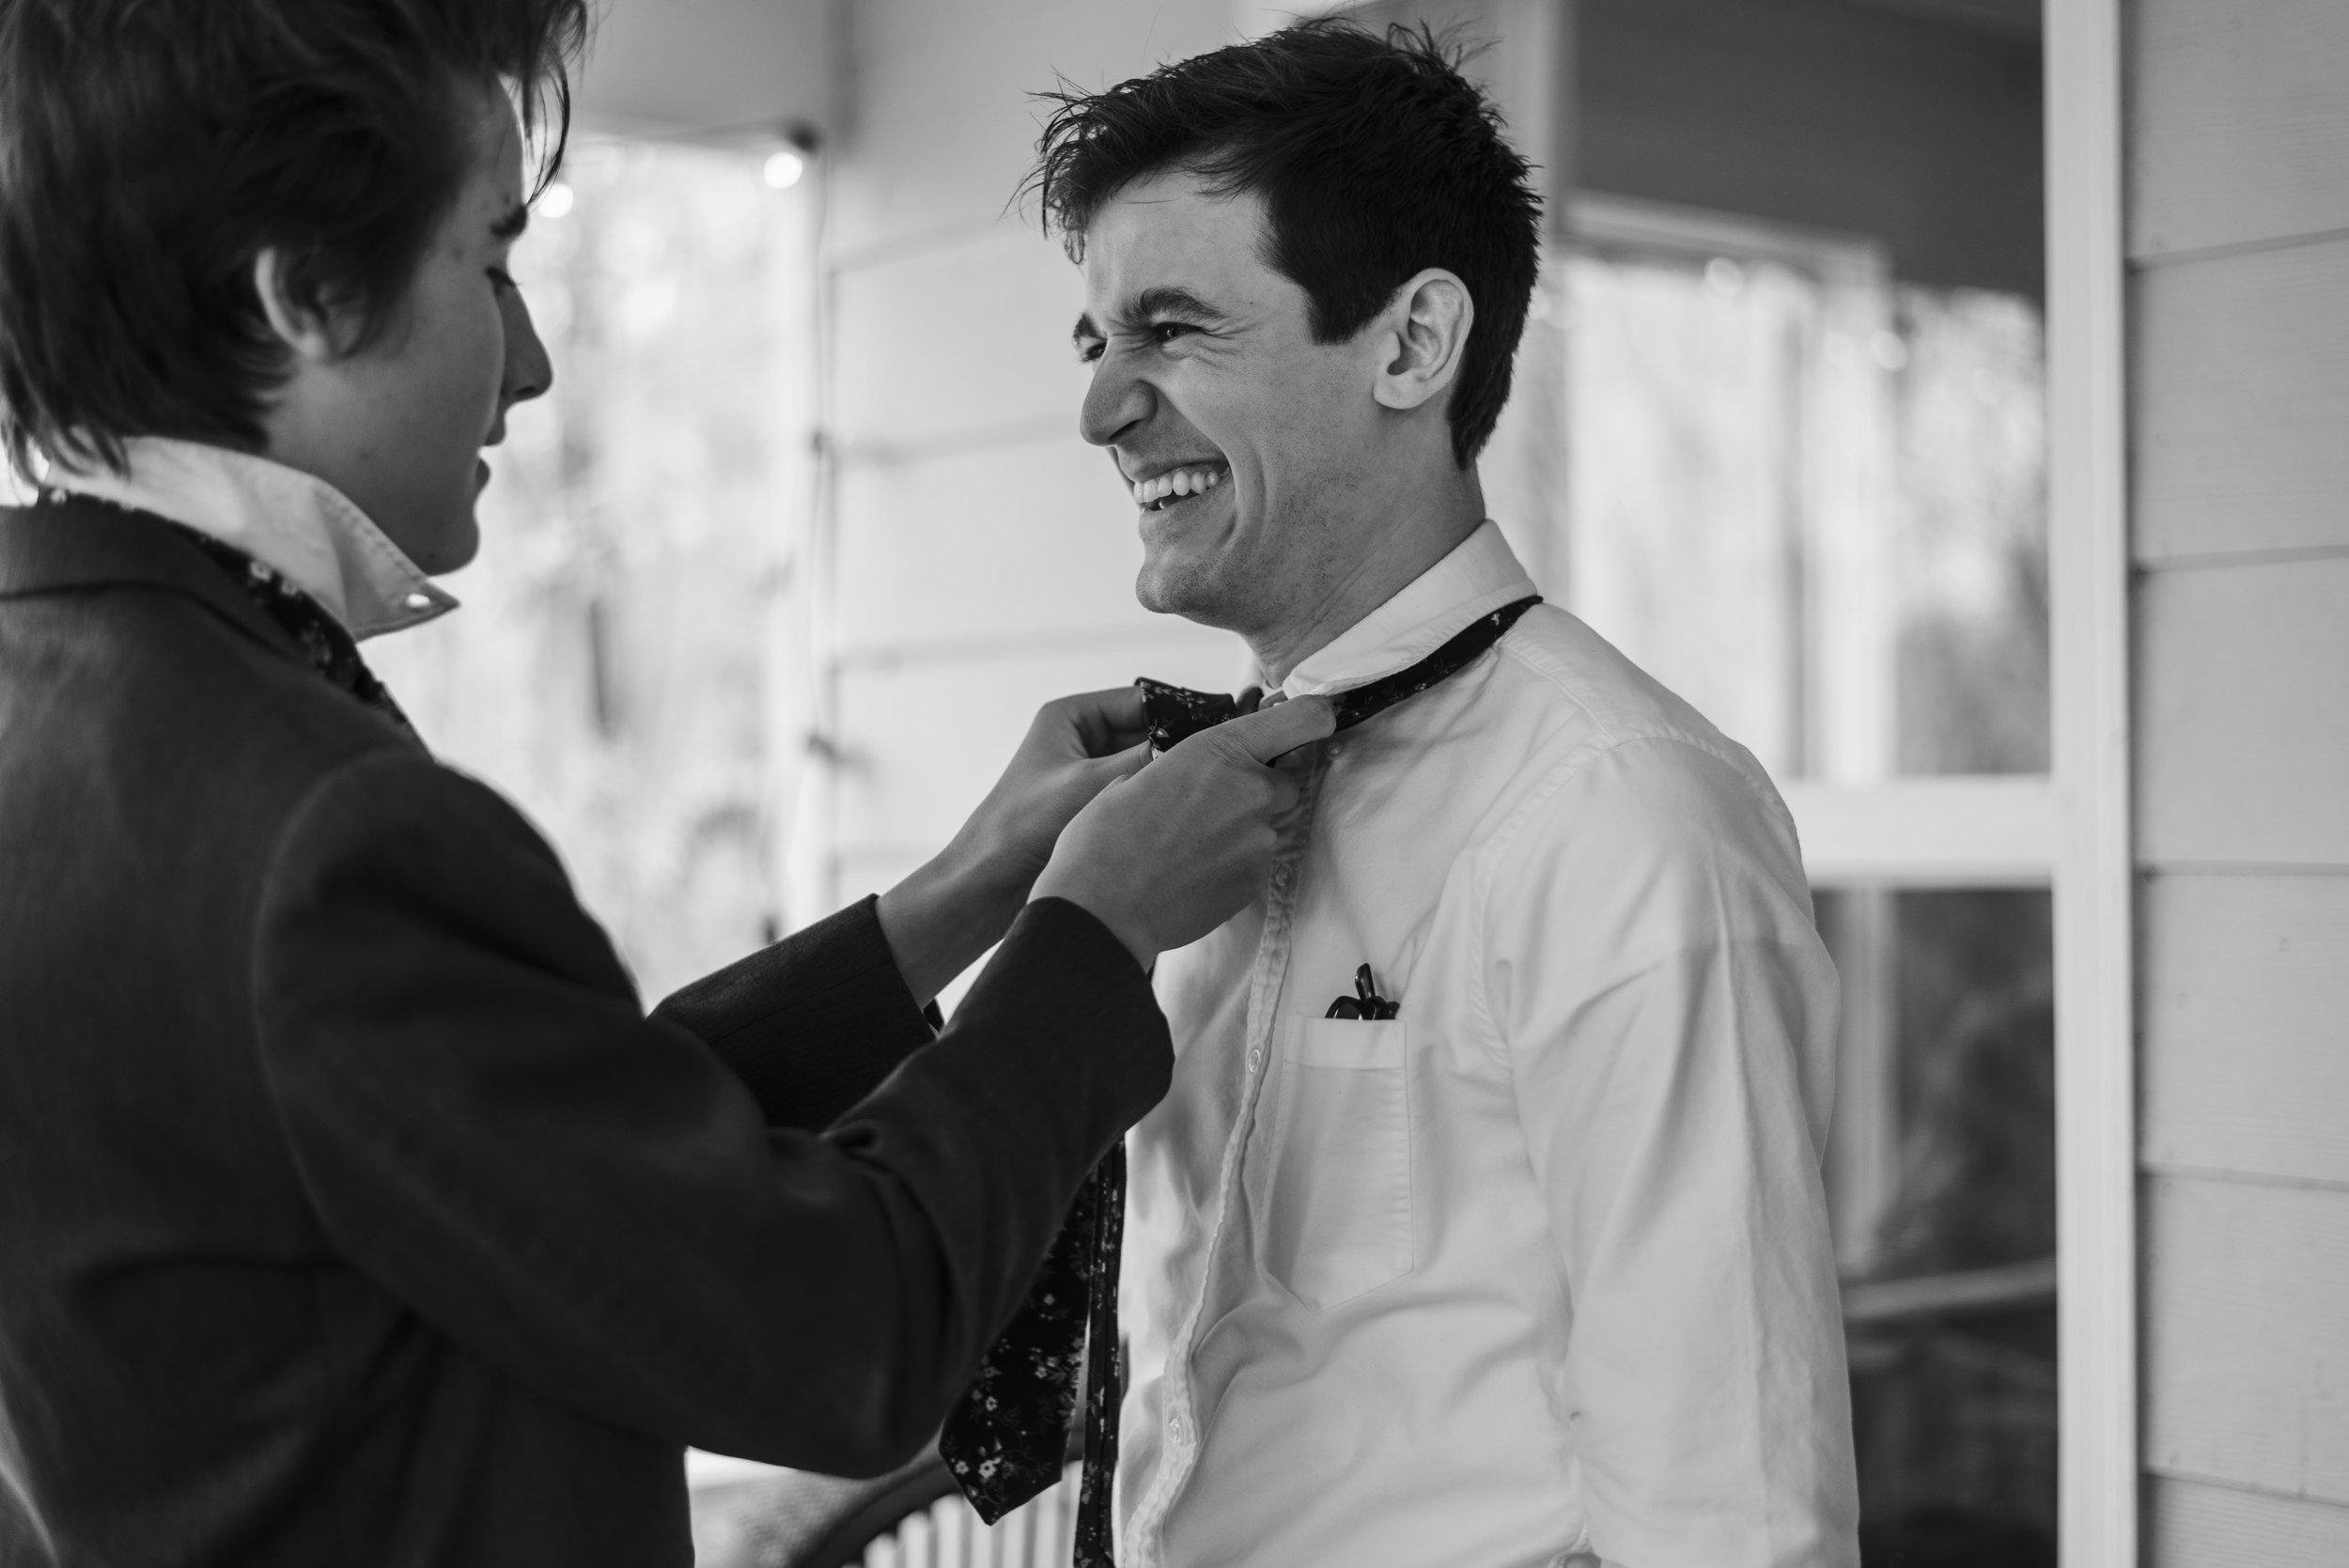 wedding groom tie chattanooga Tennessee